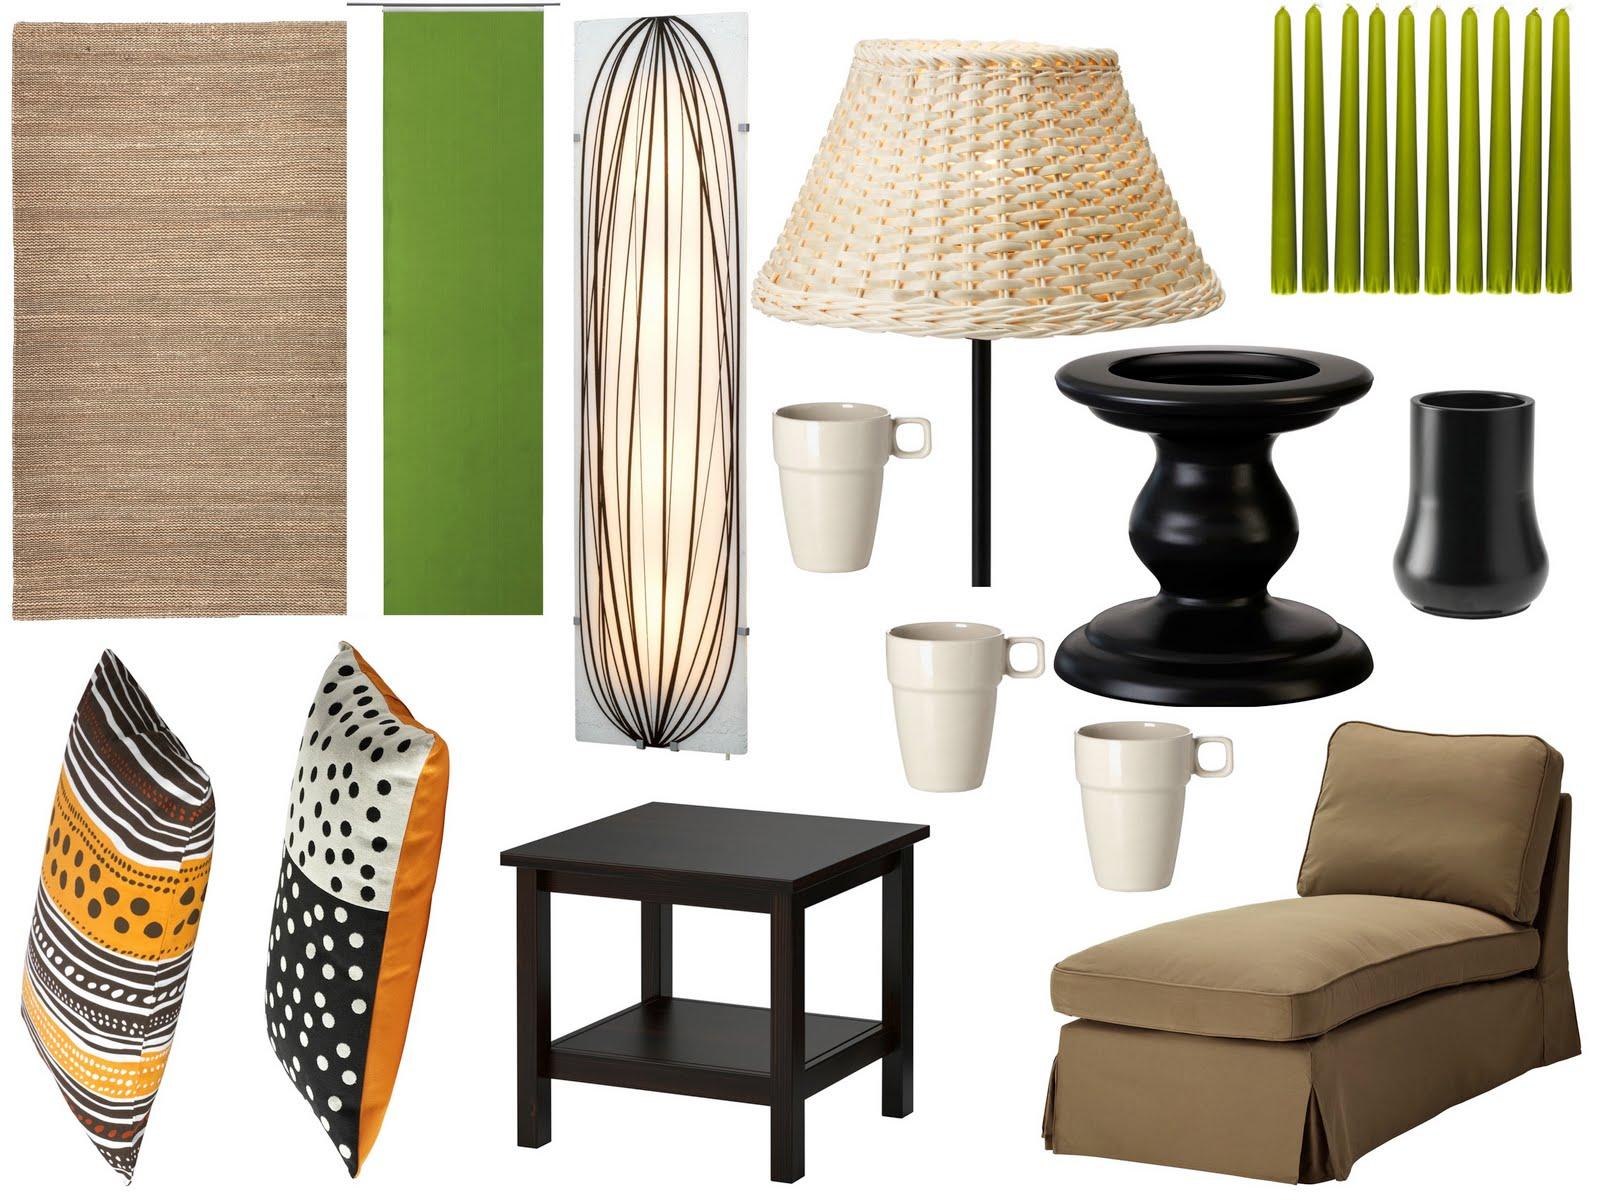 kata b log11 ethno stil weltreise vom sofa aus. Black Bedroom Furniture Sets. Home Design Ideas